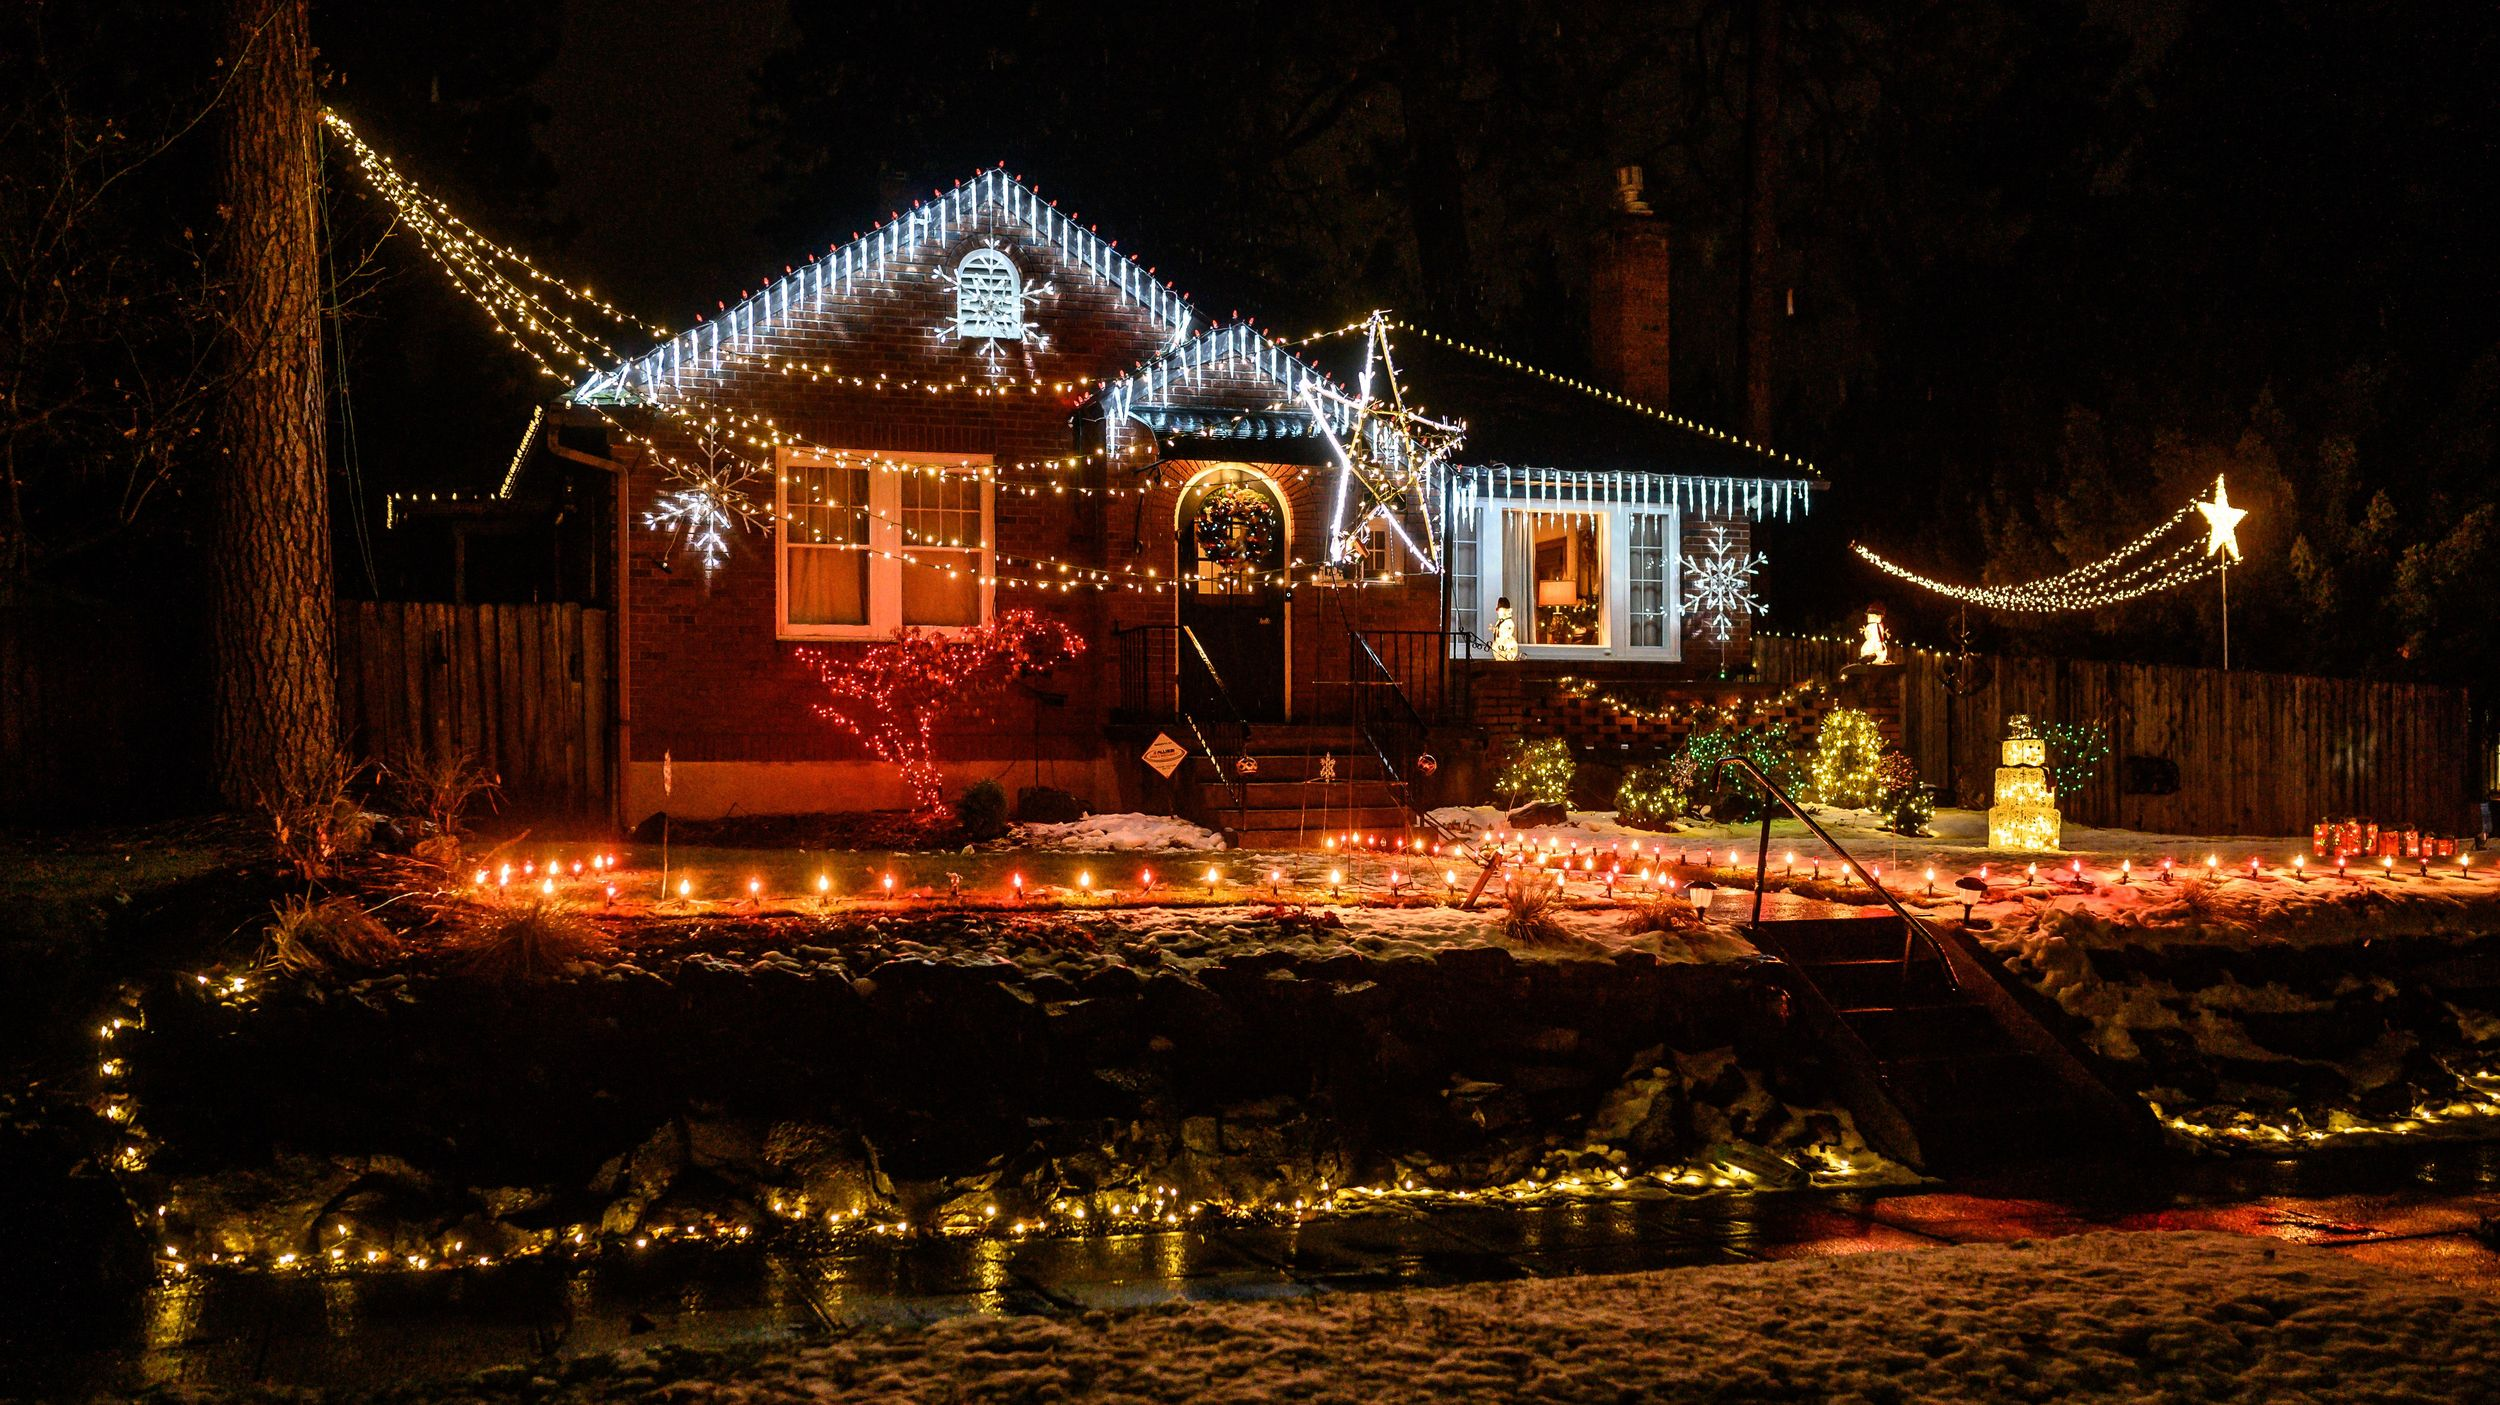 Christmas Lights Coeur D'Alene Street Neighborhood 2020 Season's sparkles: Holiday lights displays in town | The Spokesman